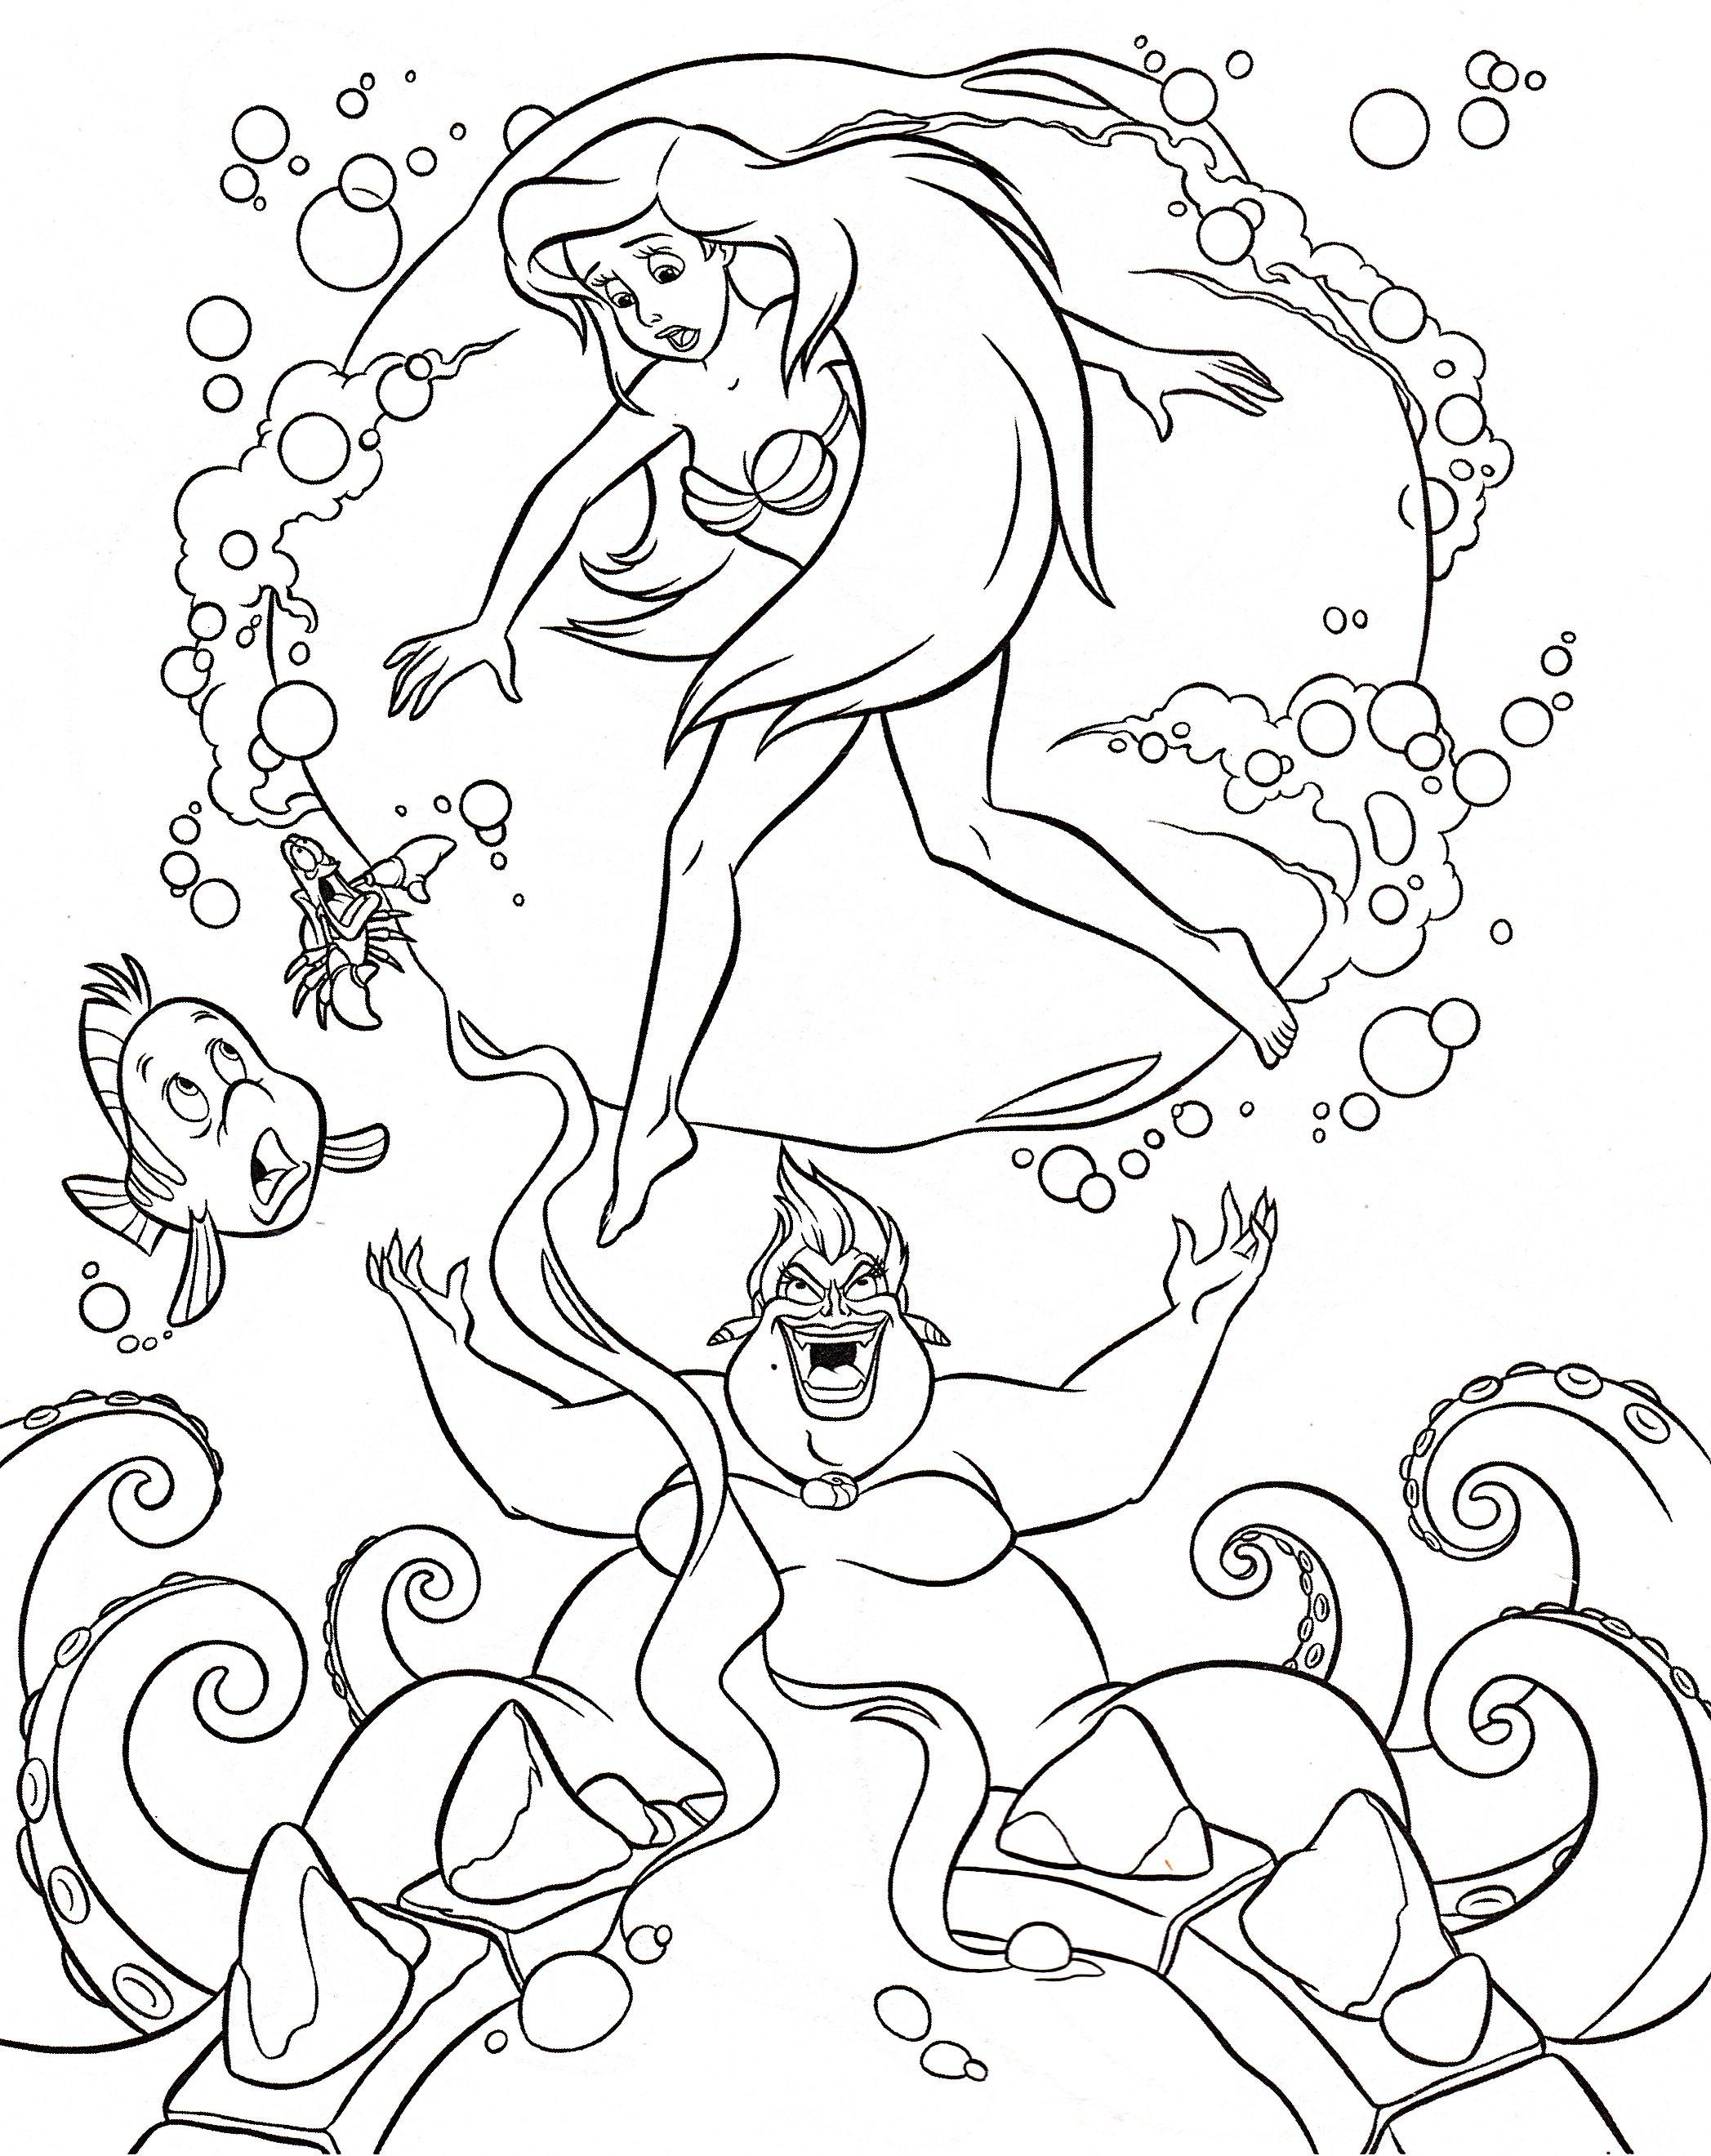 Walt Disney Characters Photo: Walt Disney Coloring Pages